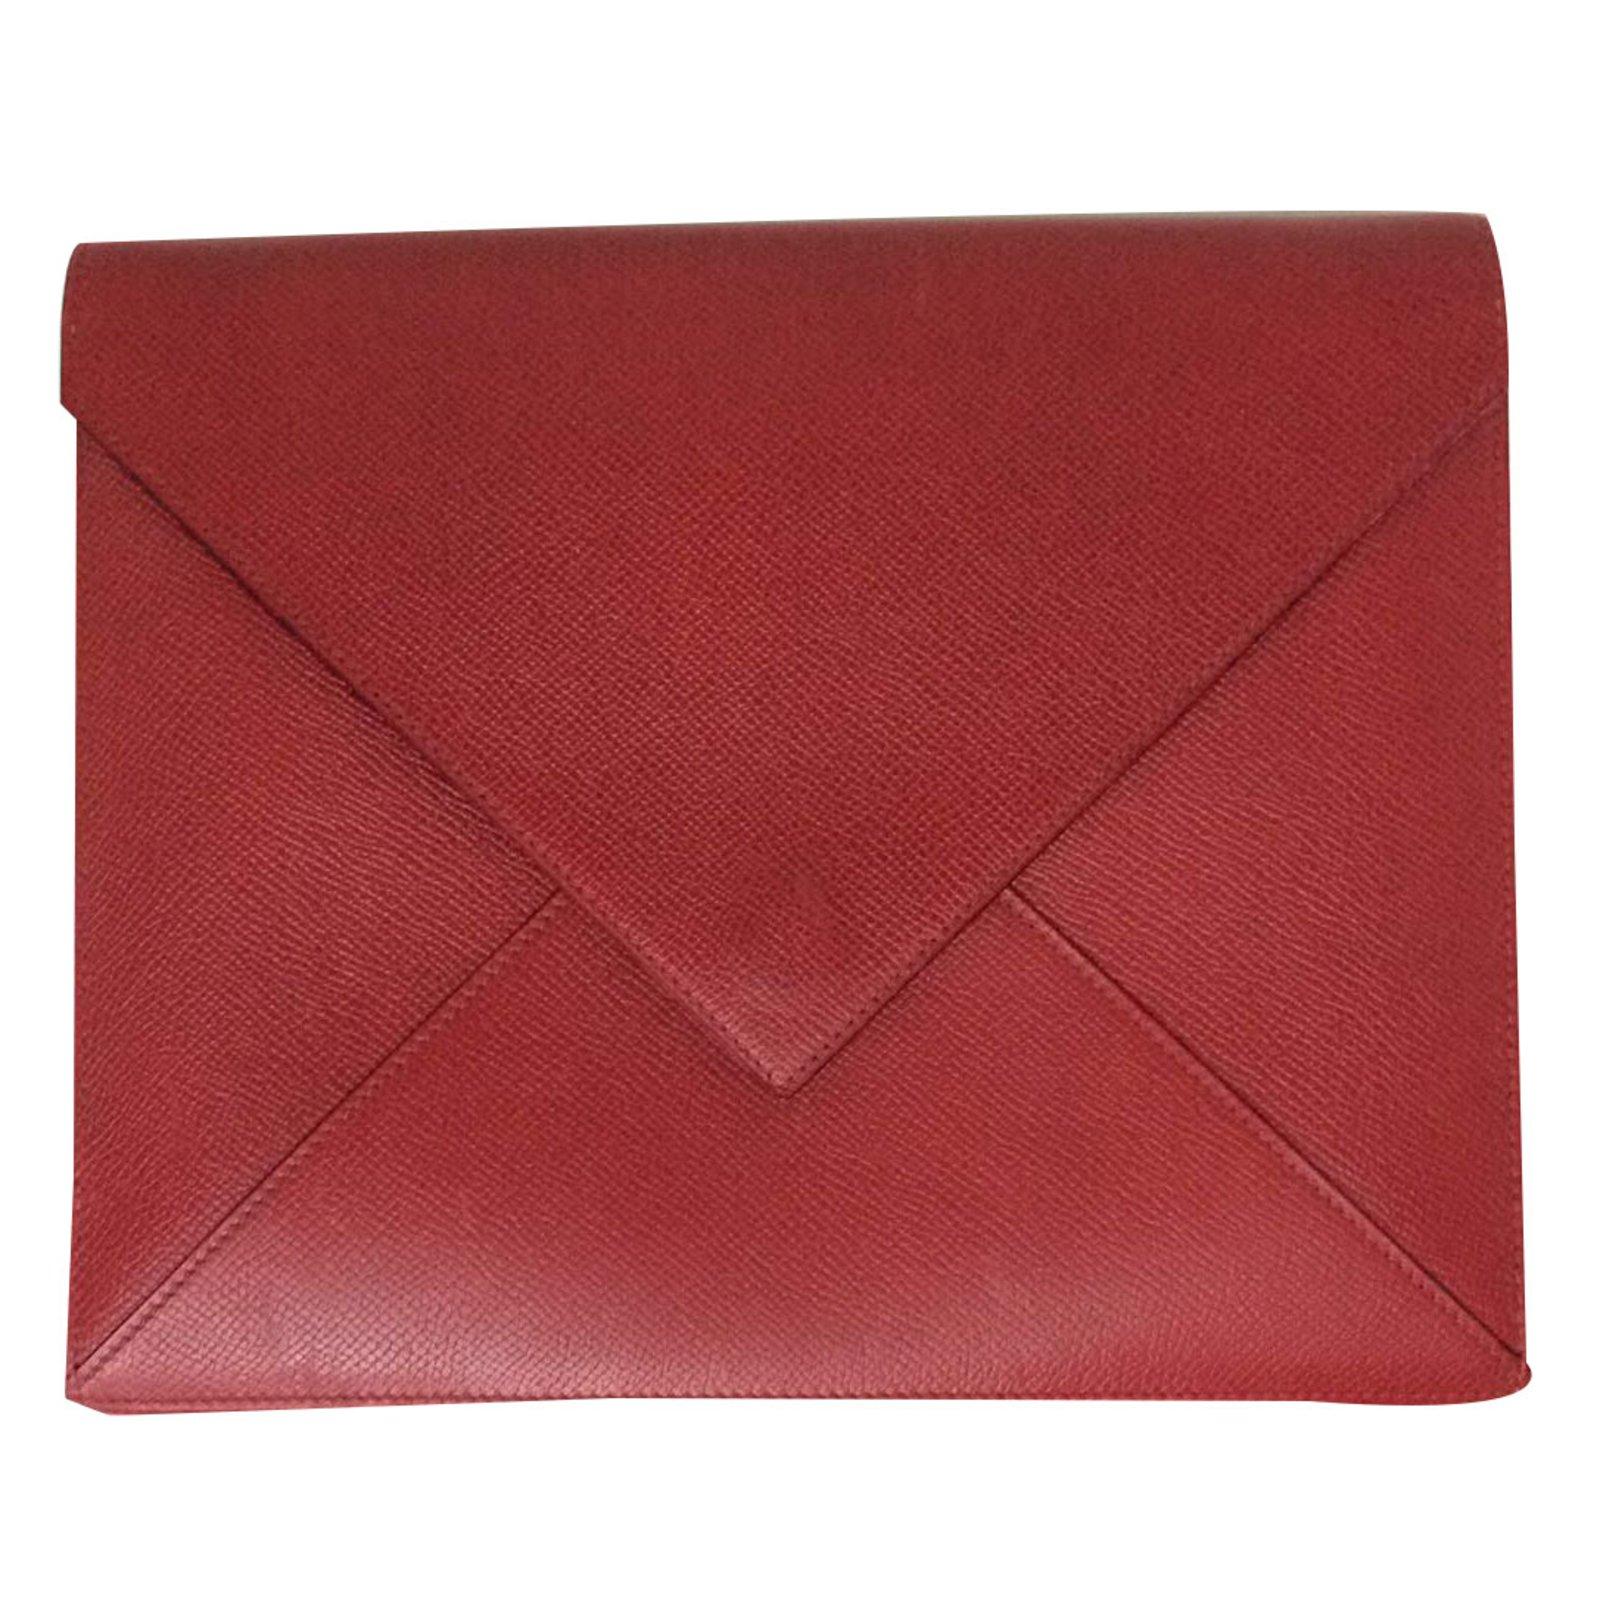 le dernier ee9a4 1ee25 Superbe Pochette enveloppe Hermès en cuir bicolore !